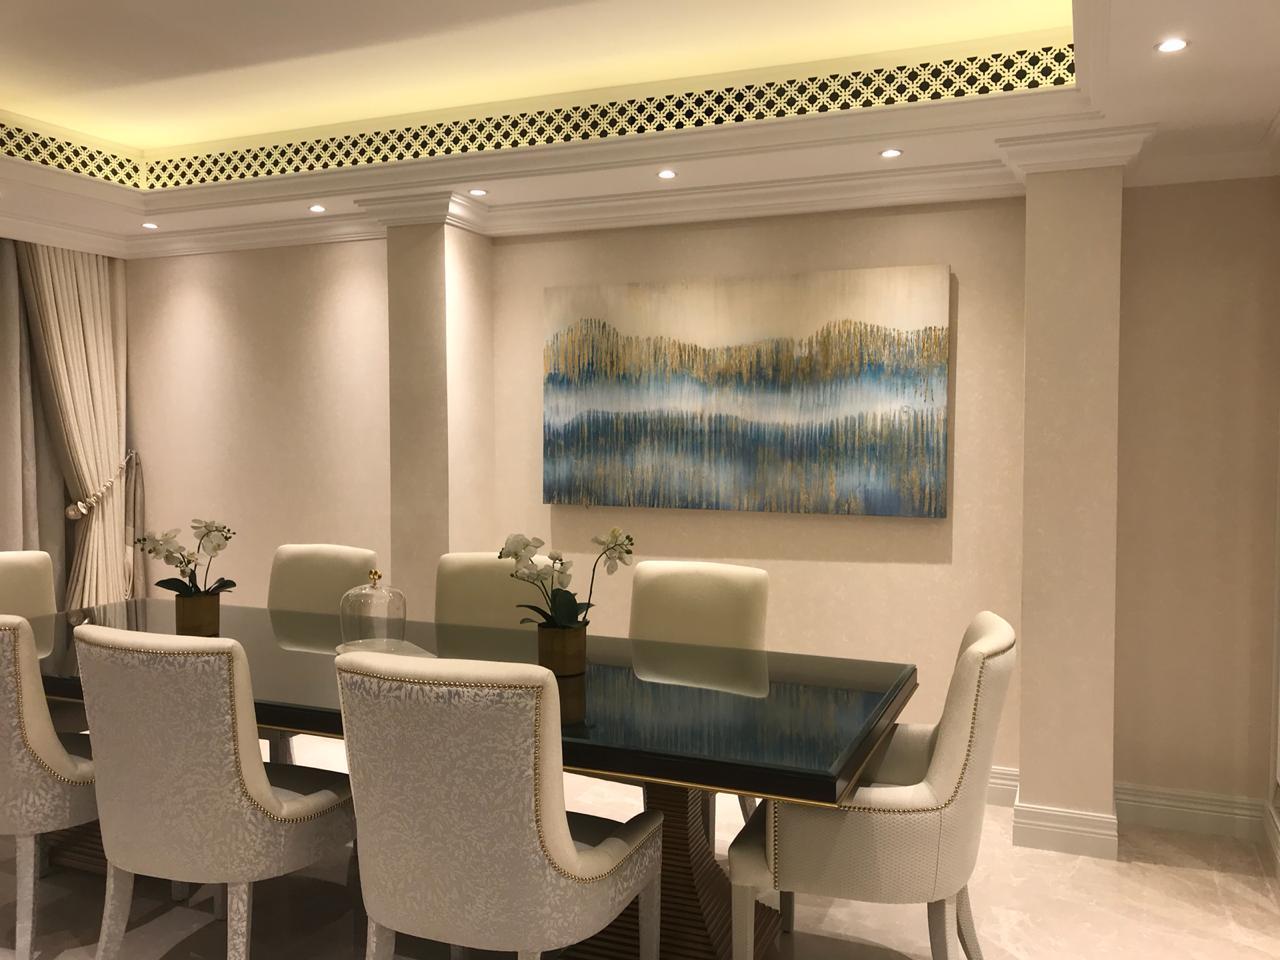 canvas framing services in Dubai